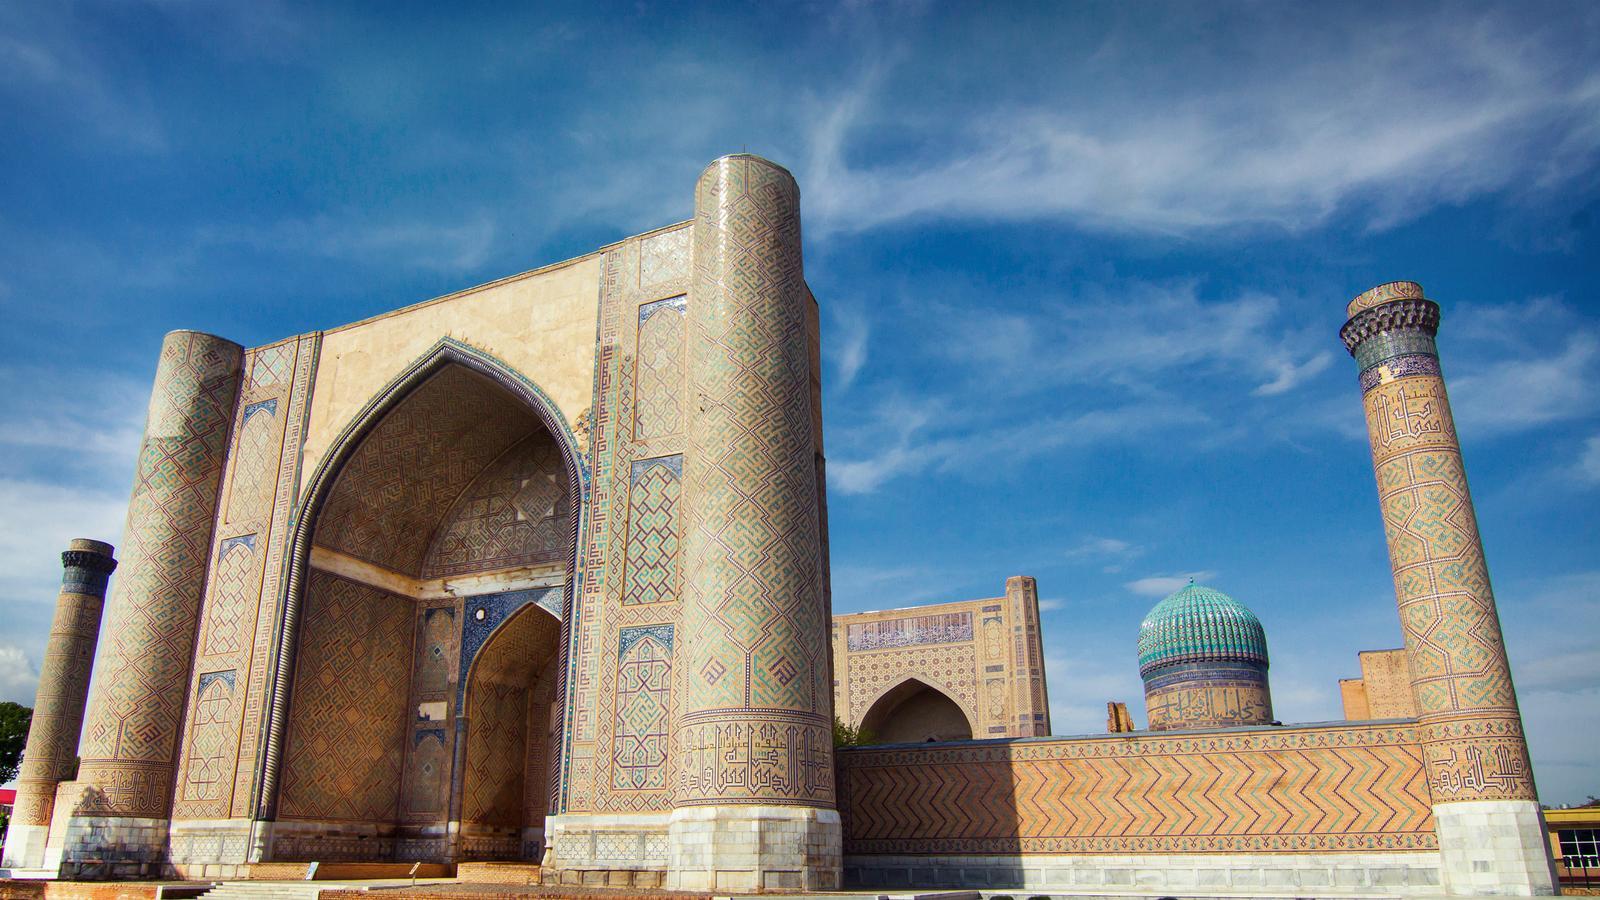 Товарооборот Казахстана и Узбекистана по итогам 2018 года увеличился в два раза и достиг $3 млрд